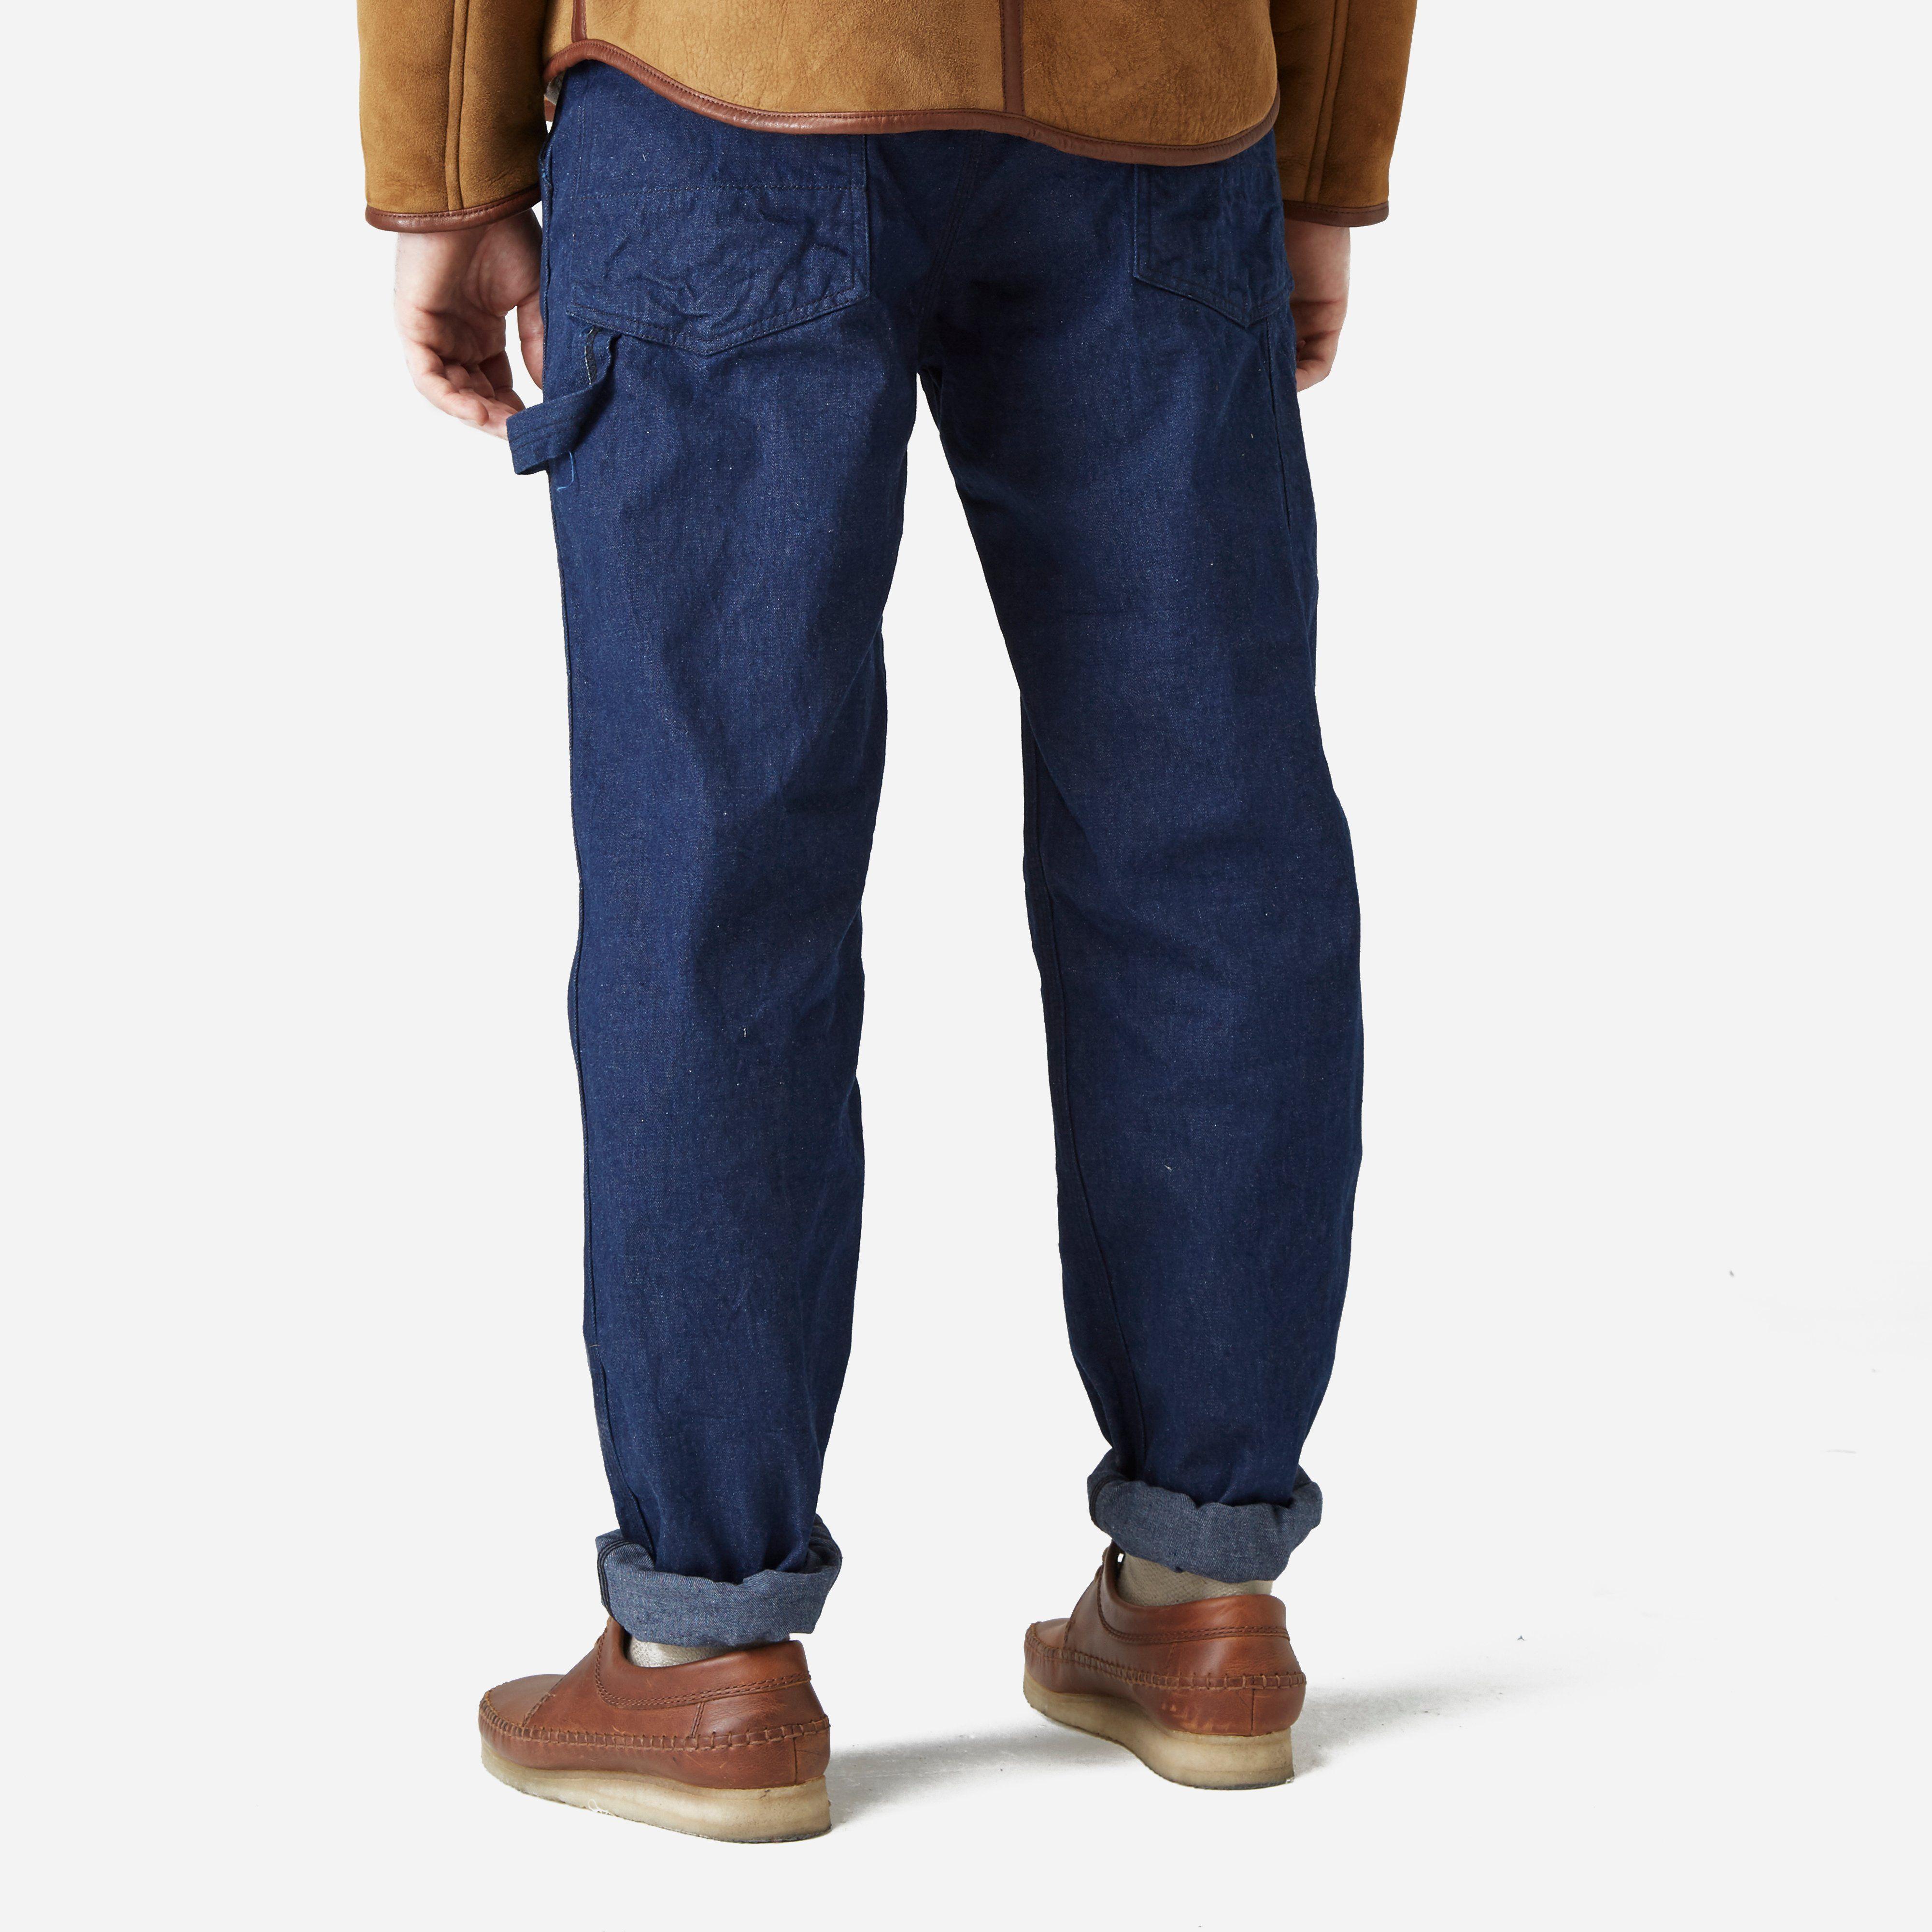 Engineered Garments Logger Pant - 11oz Cone Denim